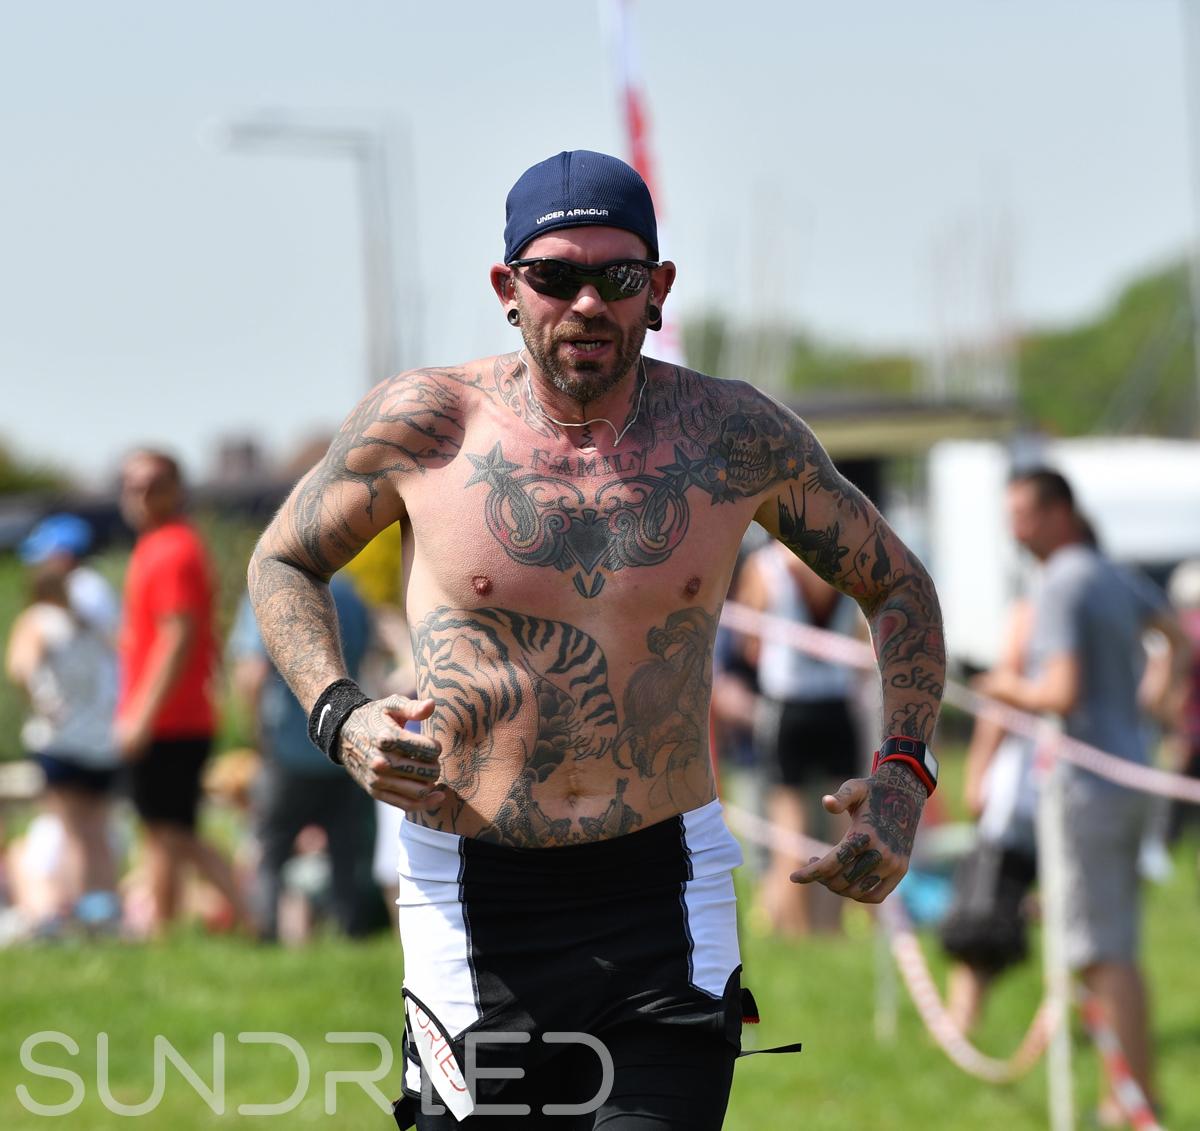 Sundried-Southend-Triathlon-2017-May-0156.jpg